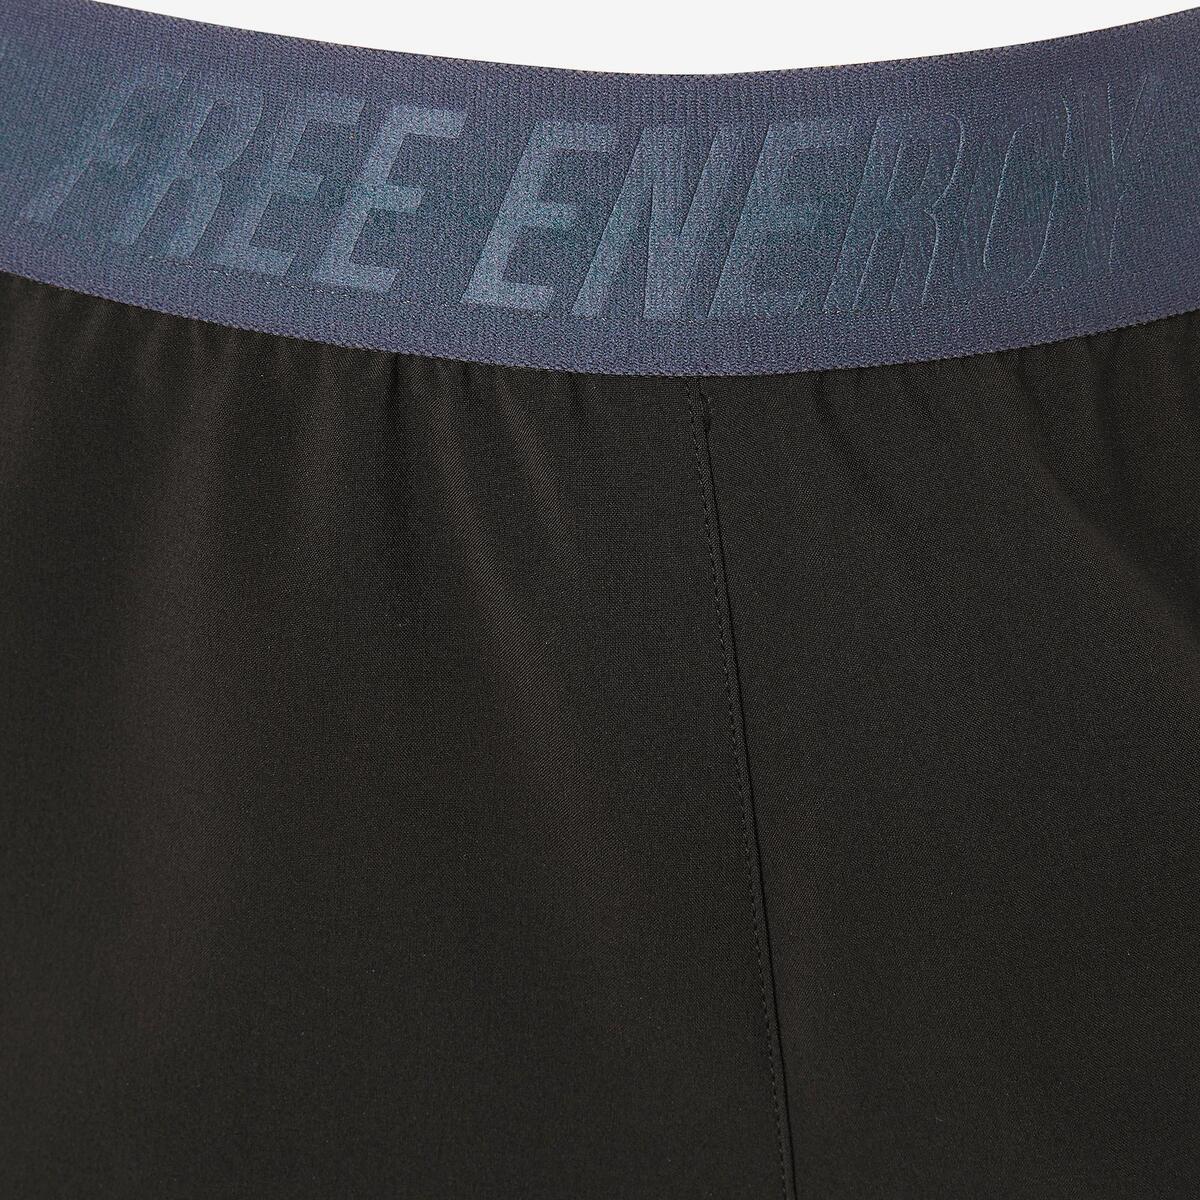 Bild 5 von Sporthose kurz W900 Gym Kinder schwarz mit Print